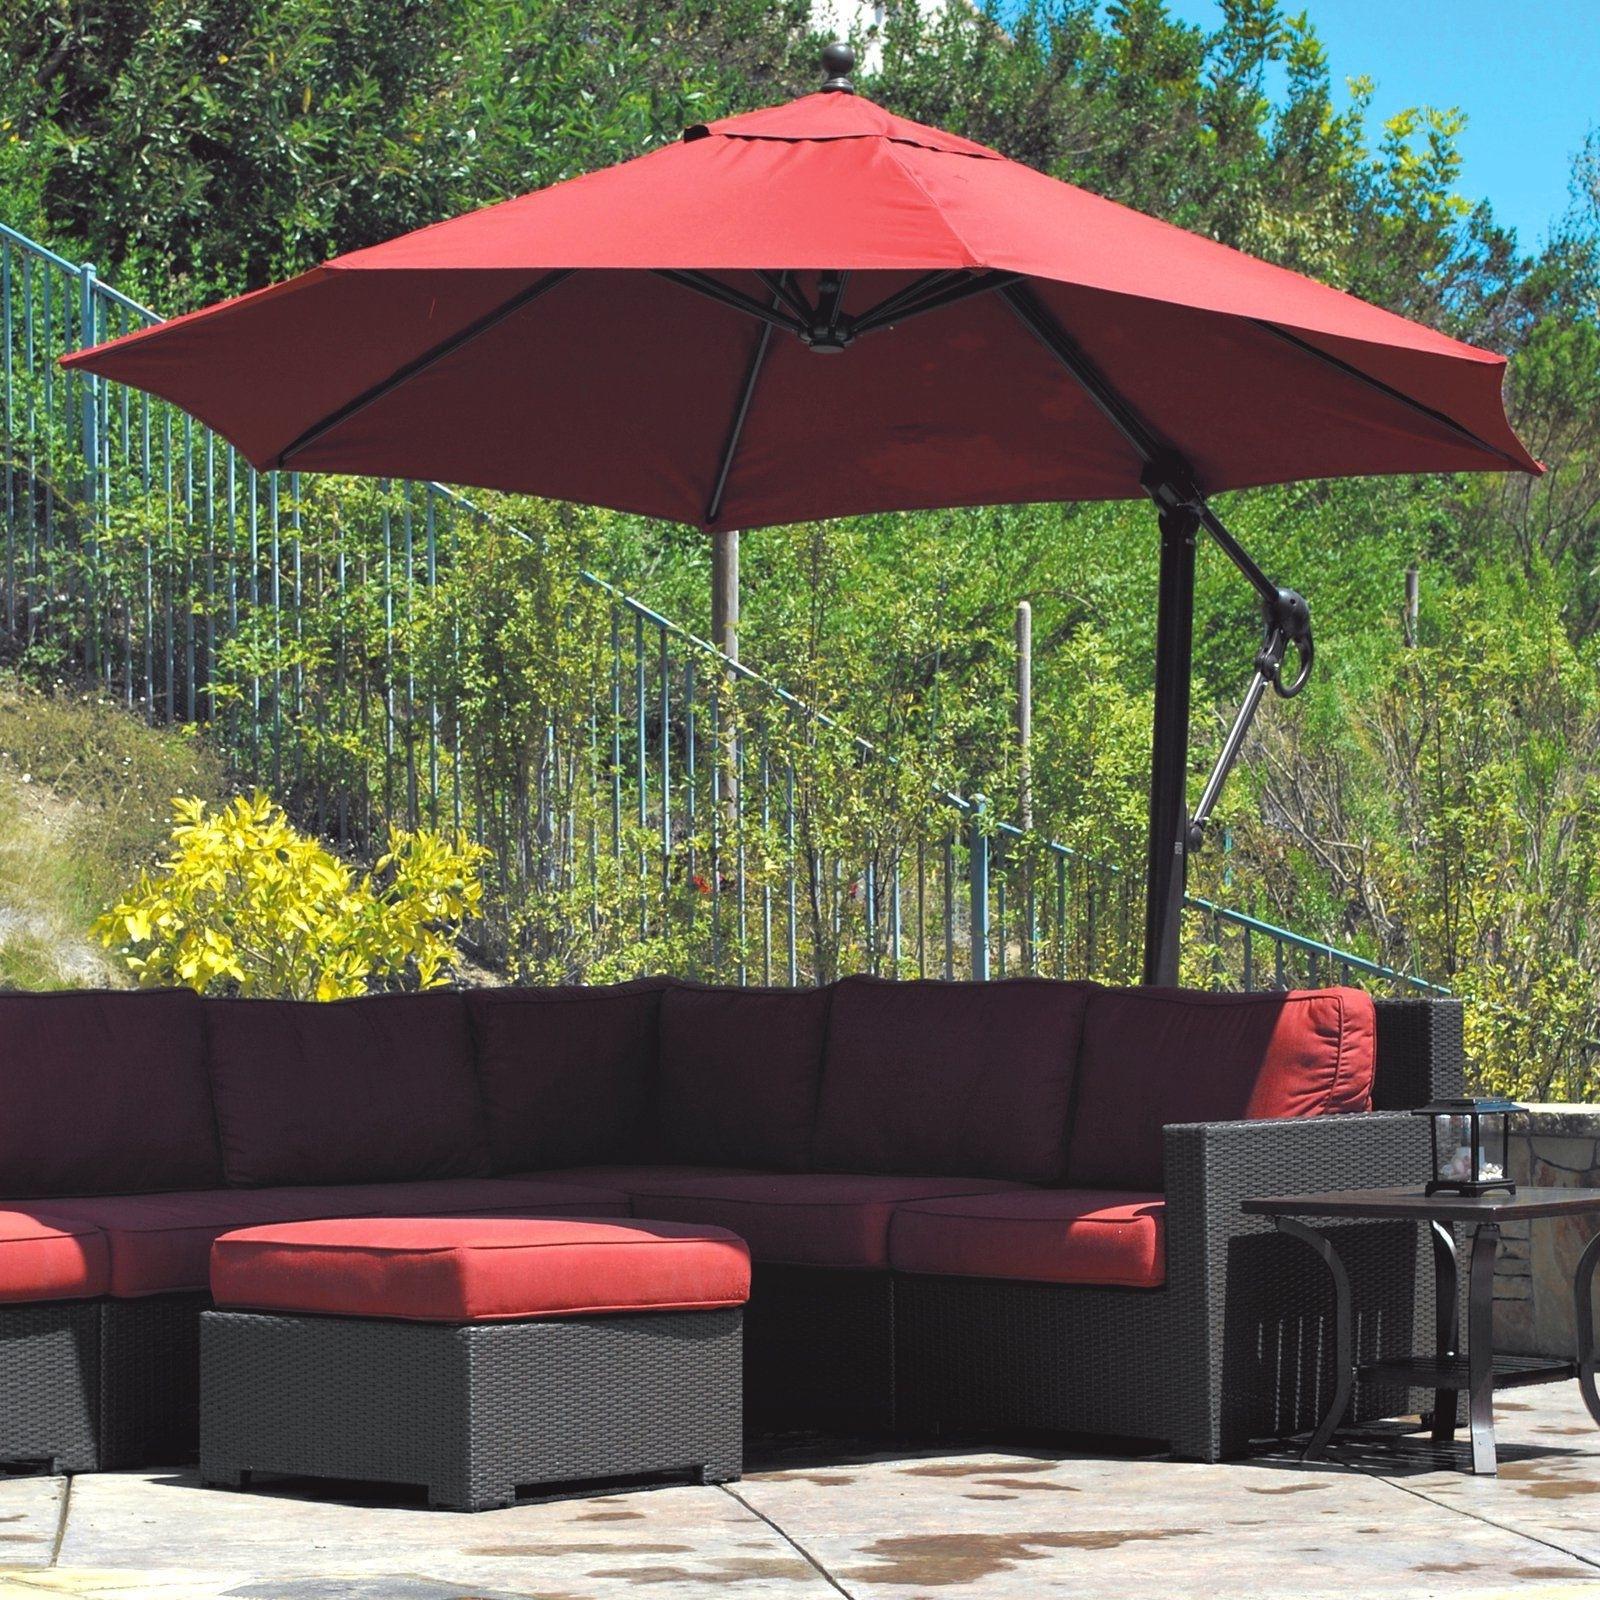 Most Popular Lowes Patio Umbrella – Home Design Ideas For Patio Umbrellas At Lowes (View 13 of 20)